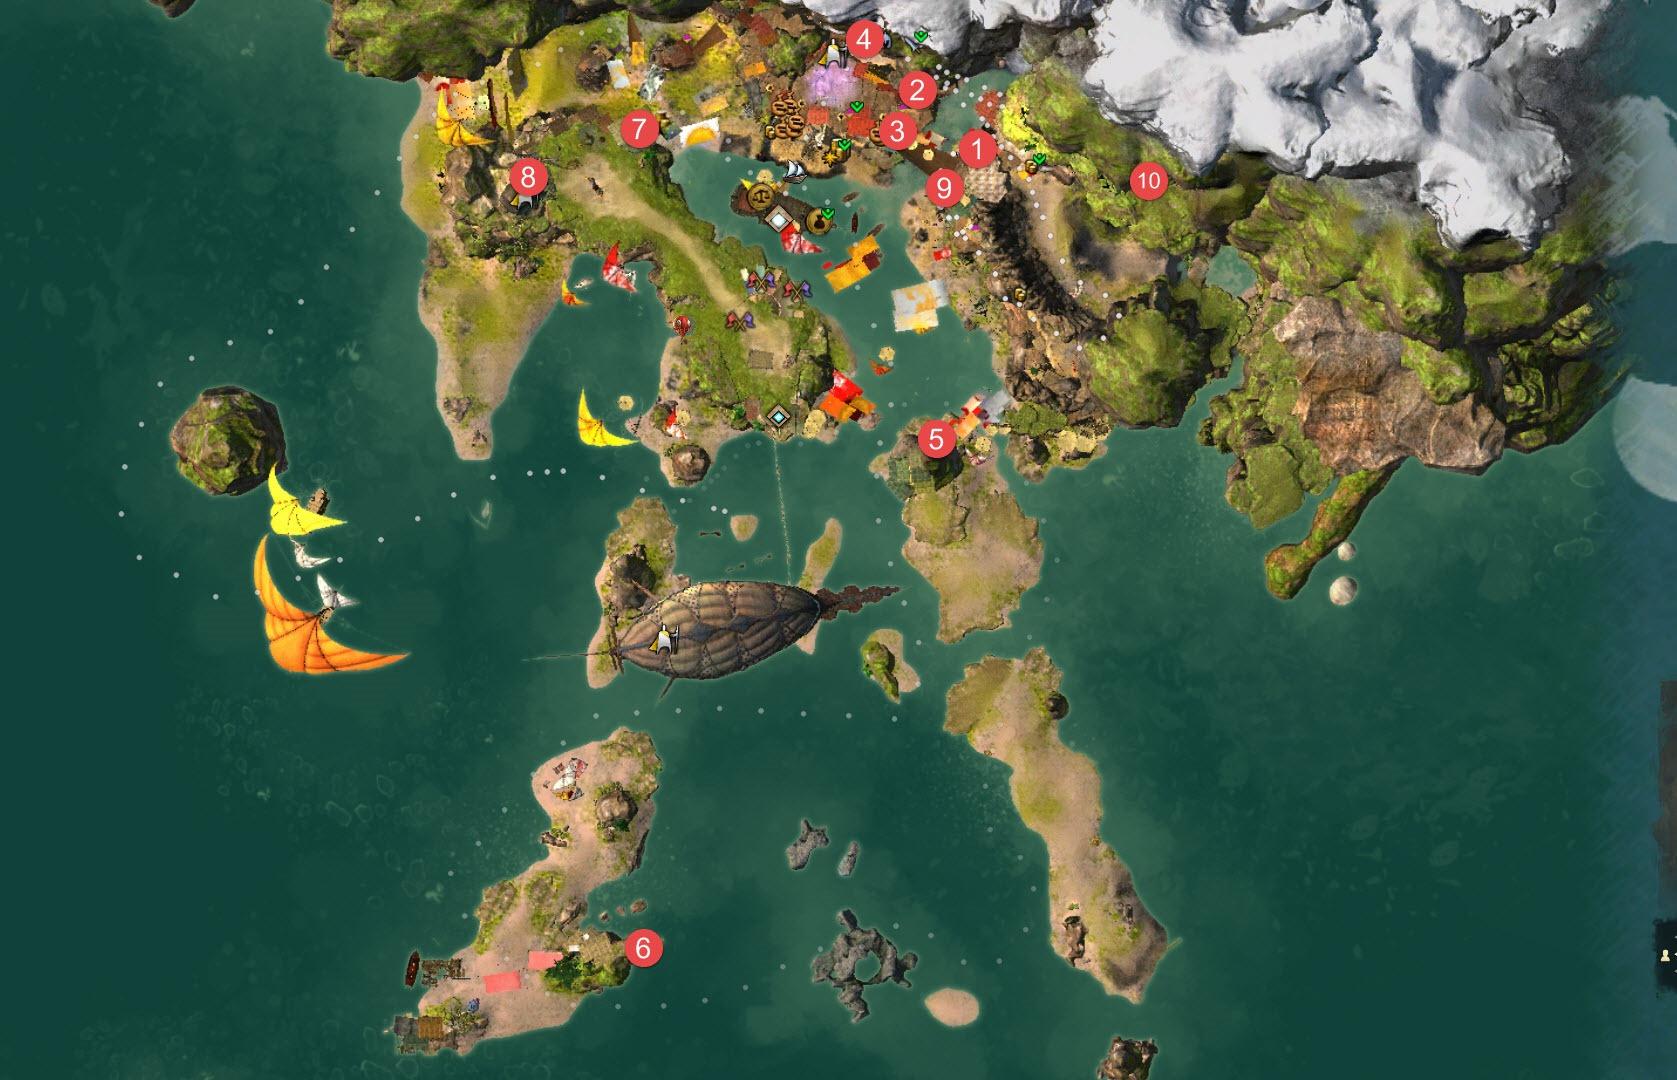 gw2-master-aspect-gatherer-map